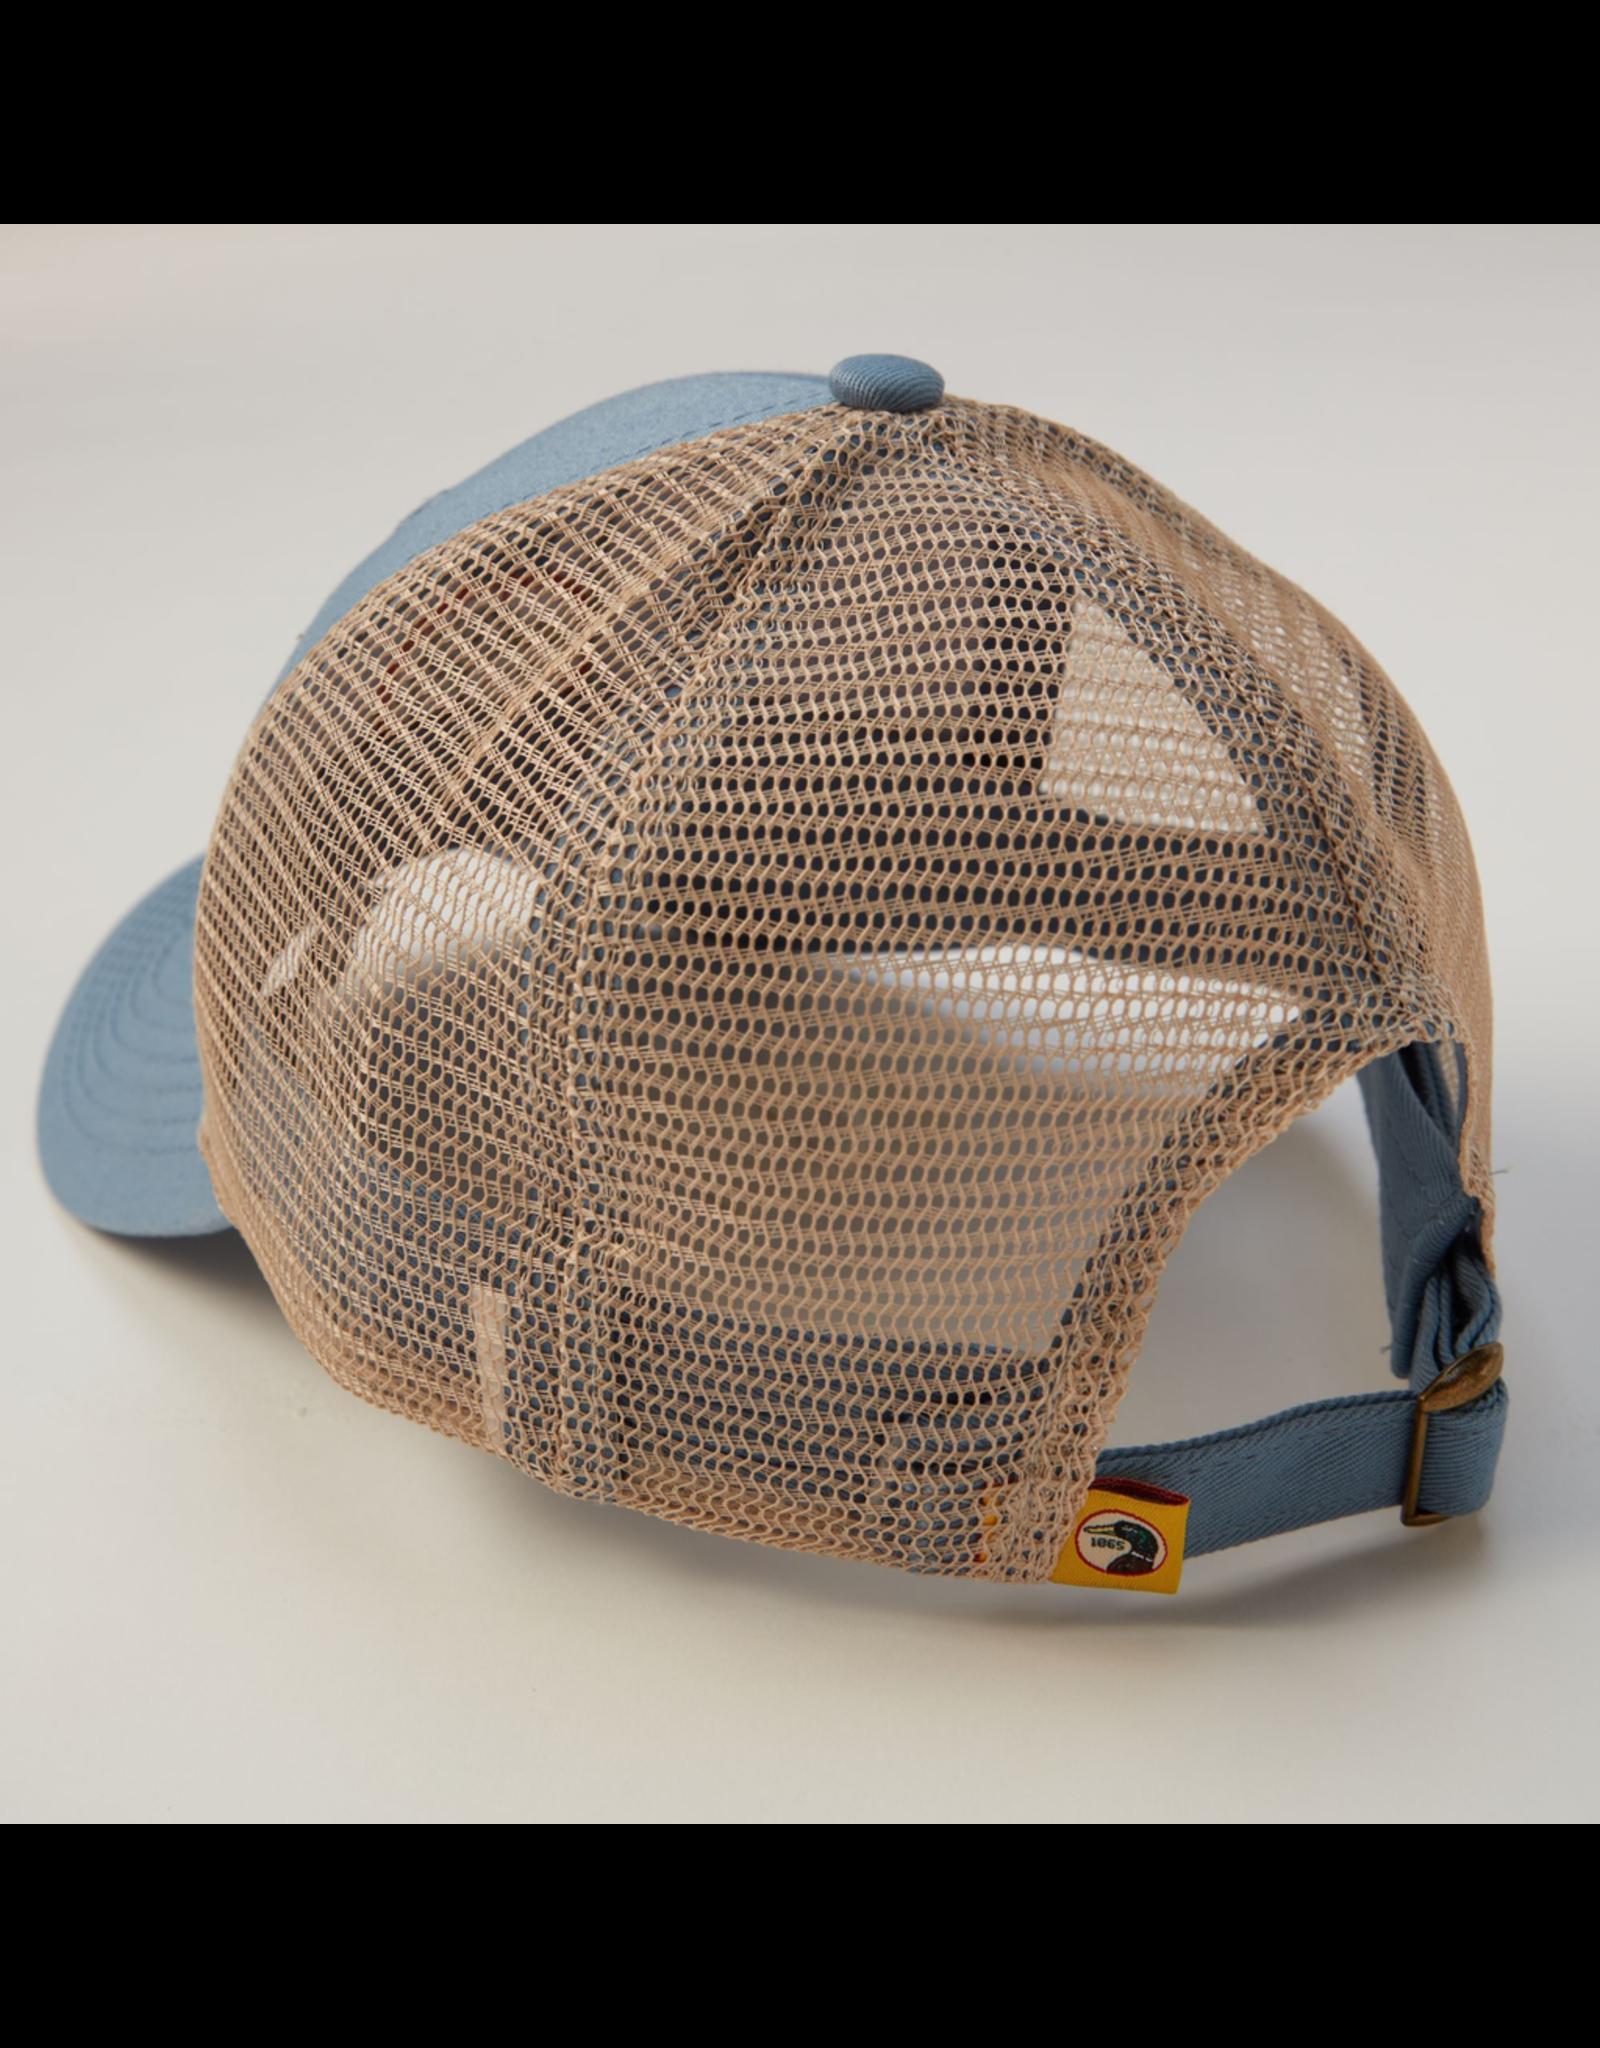 Hats DUCKHEAD D41007 CIRCLE PATCH TRUCKER HAT, OSFM, STEEL 435